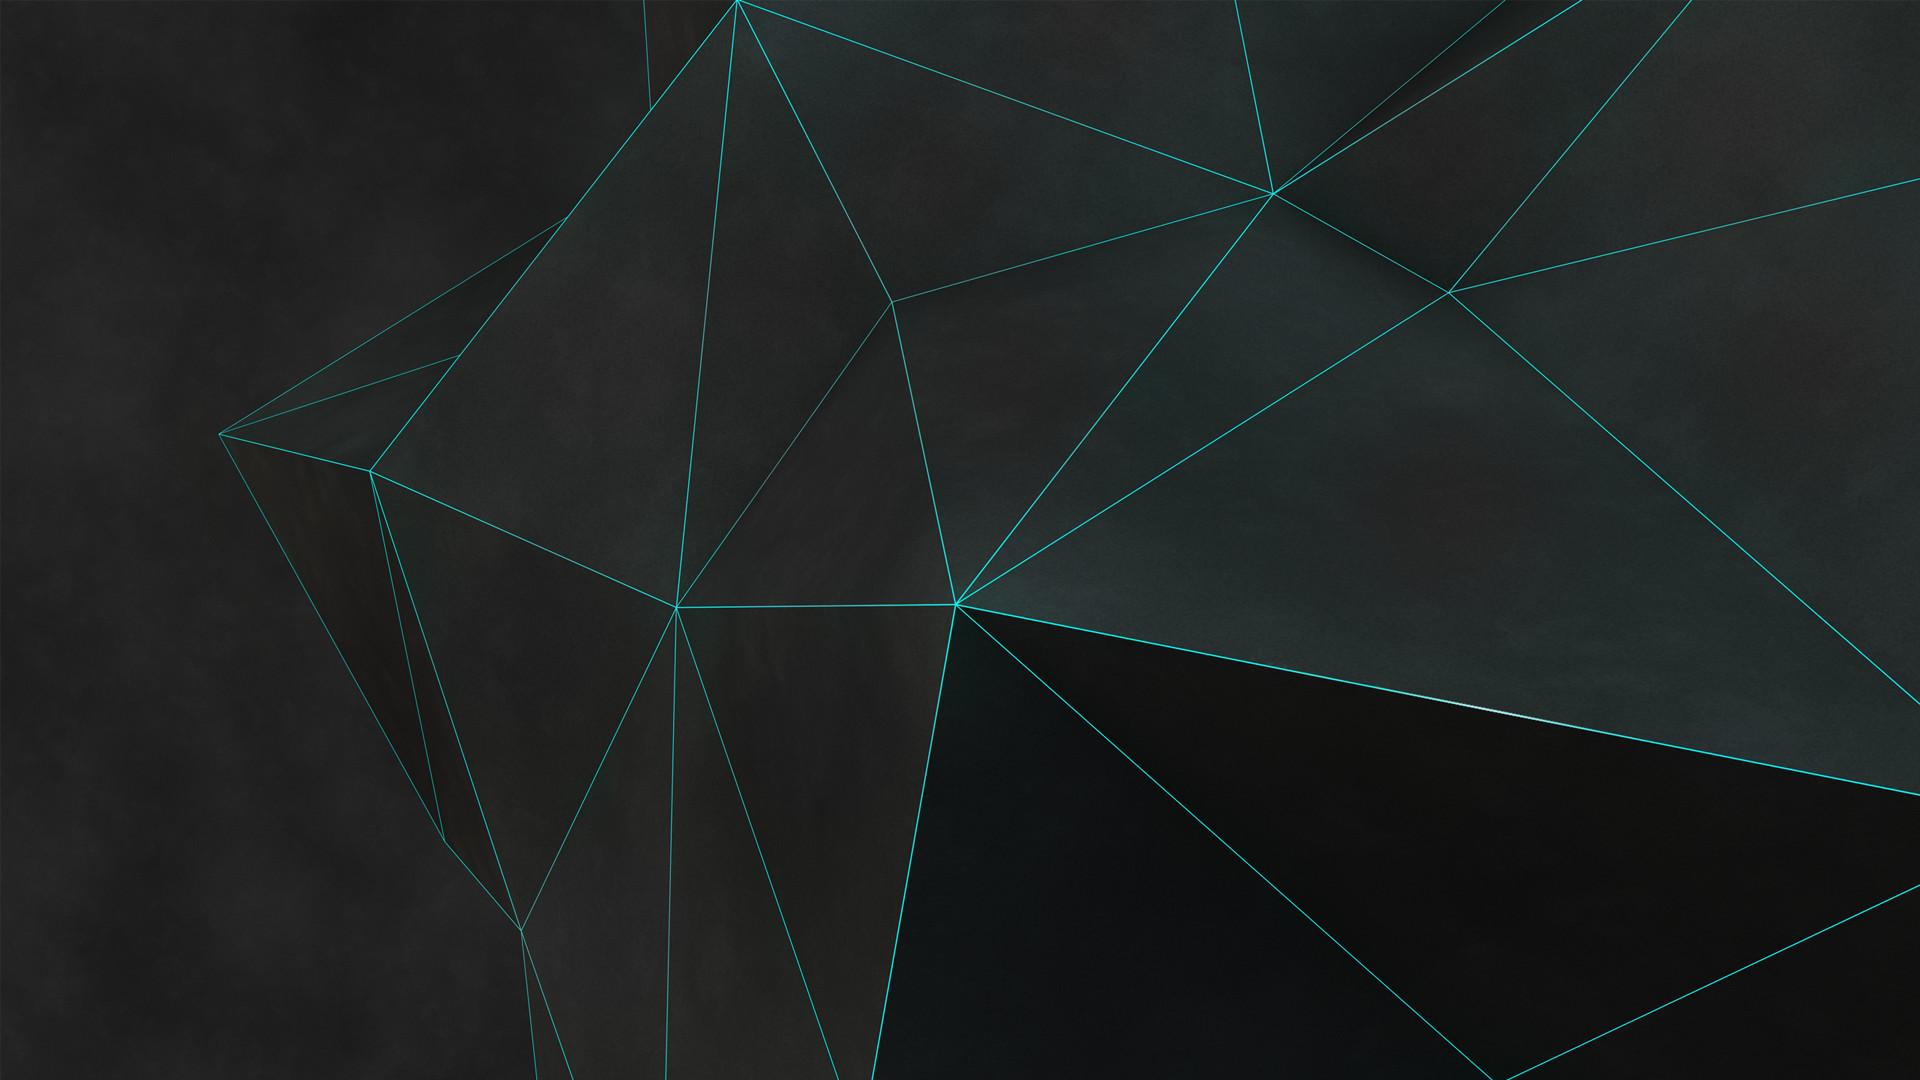 Polygon Art 3D Texture Wallpaper | polygon art 3d texture wallpaper 1080p,  polygon art 3d texture wallpaper desktop, polygon art 3d texture wallpap…